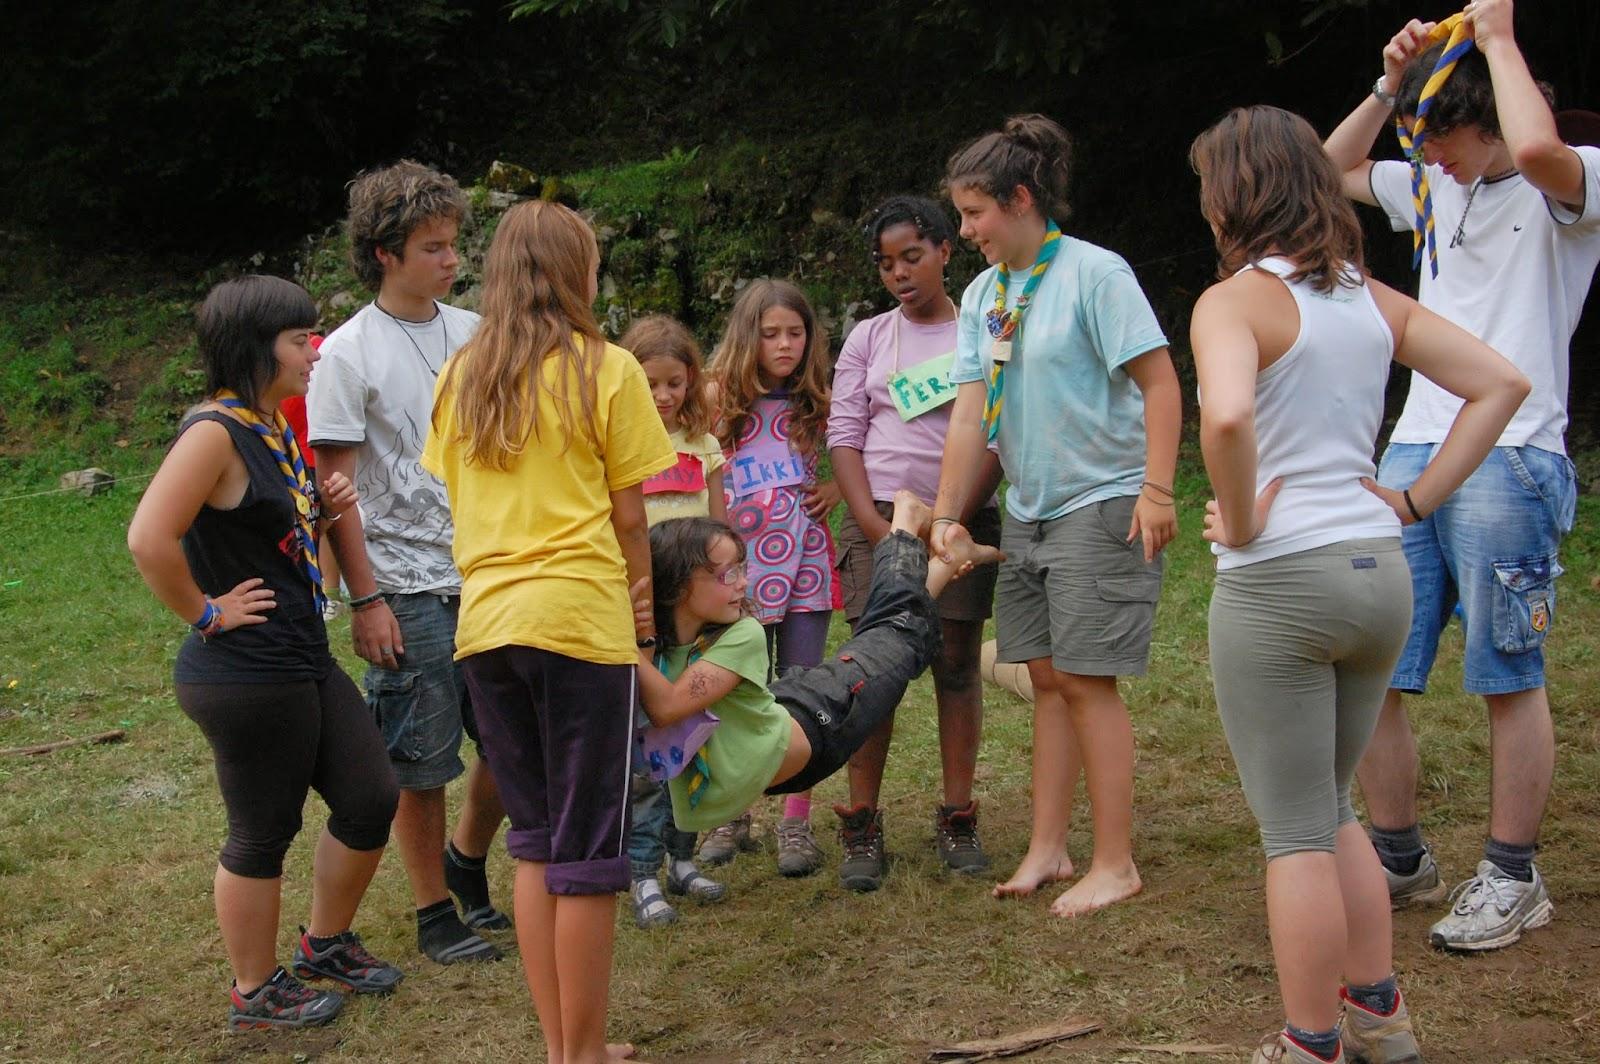 Campaments Estiu RolandKing 2011 - DSC_0234.JPG